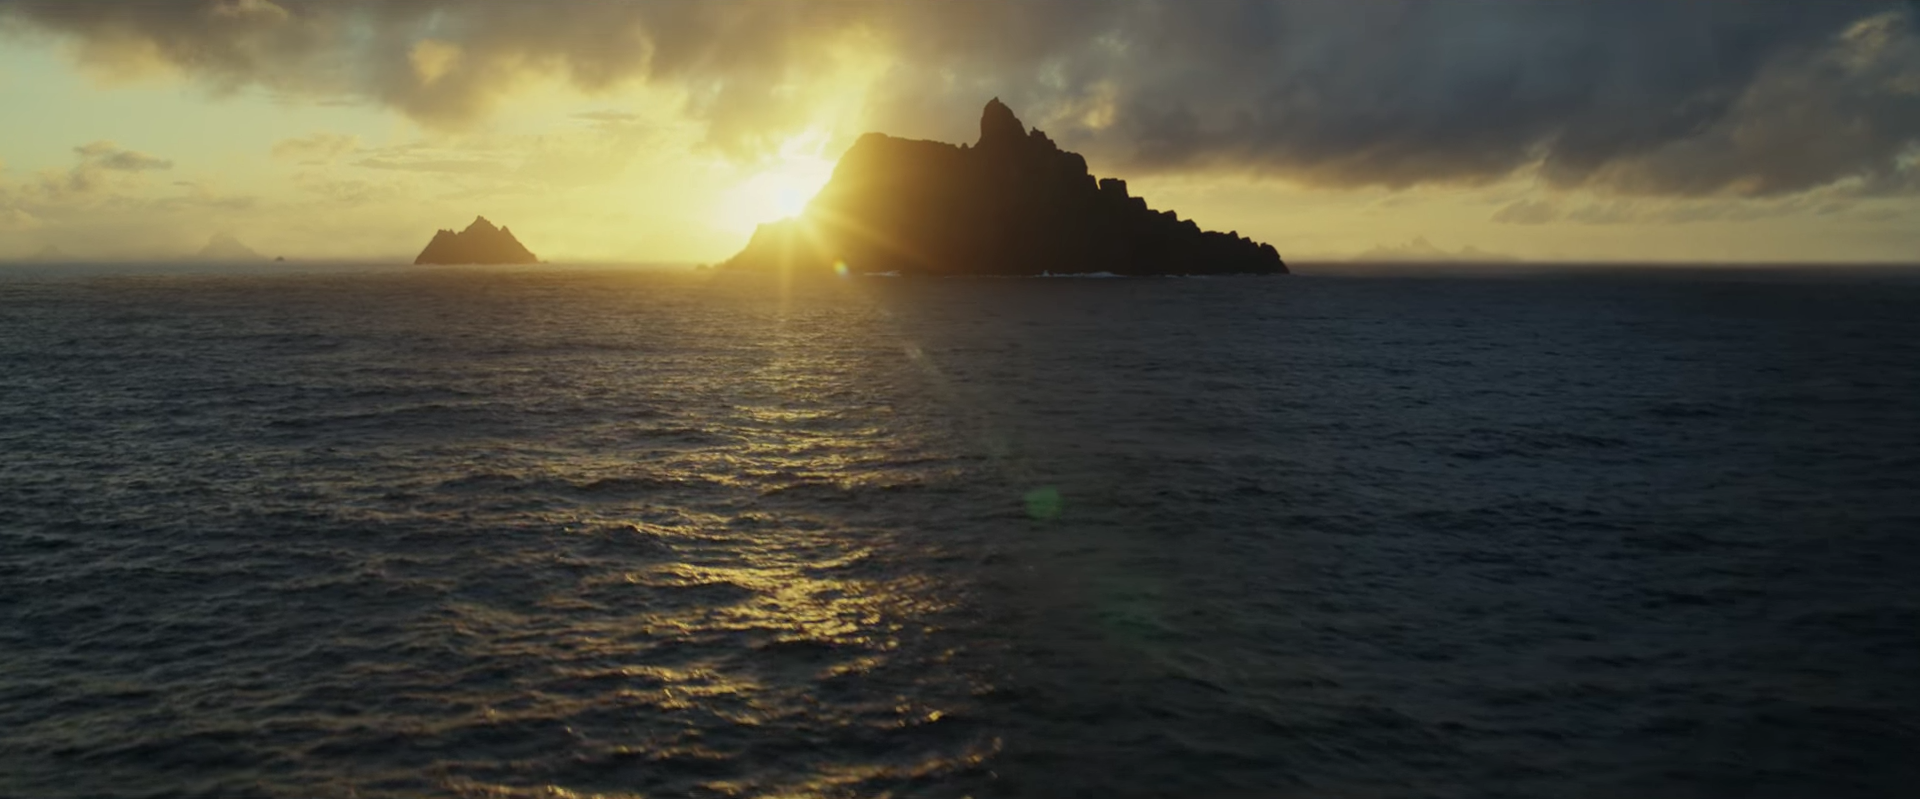 Breaking Down The Last Jedi Trailer Scene By Scene The Verge